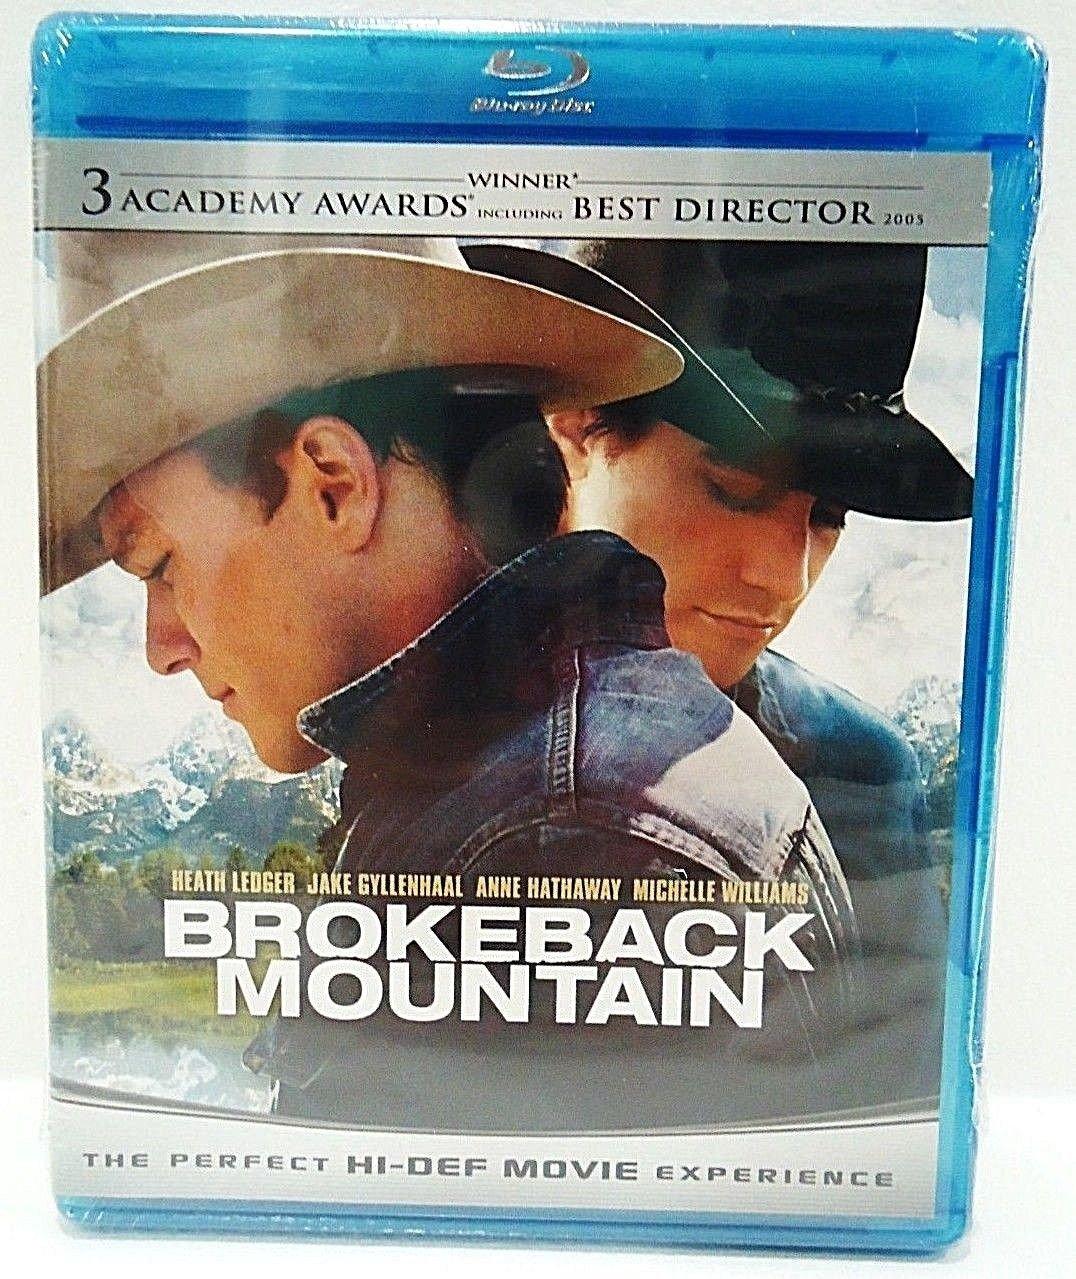 BROKEBACK MOUNTAIN - BLURAY - DVD - HEATH LEDGER - JAKE GYLLENHAAL - NEW - MOVIE